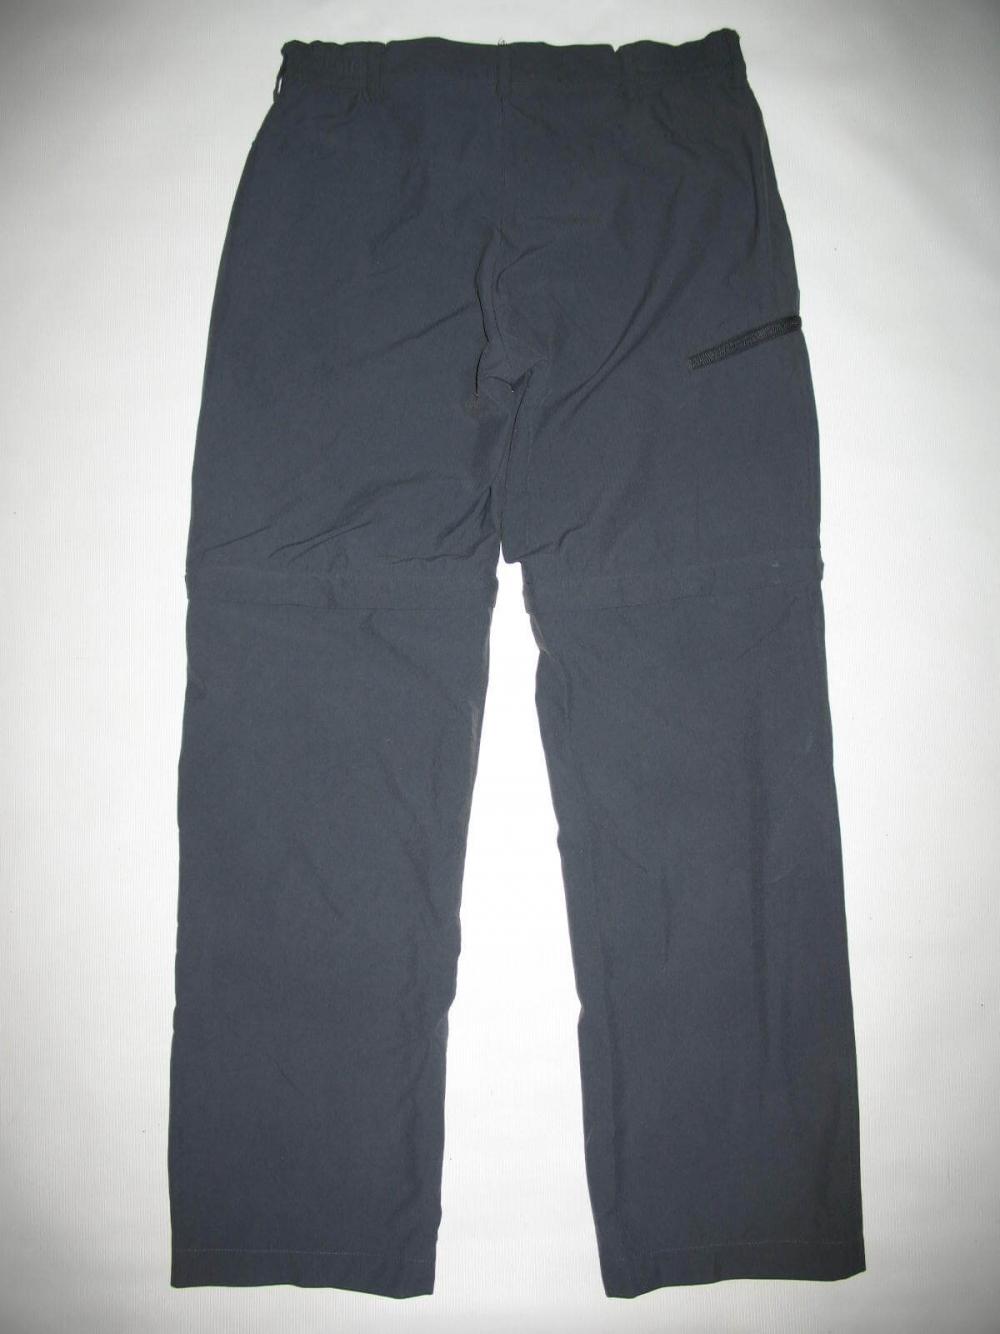 Штаны FJALLRAVEN 2in1 pants lady (размер 36/S) - 1